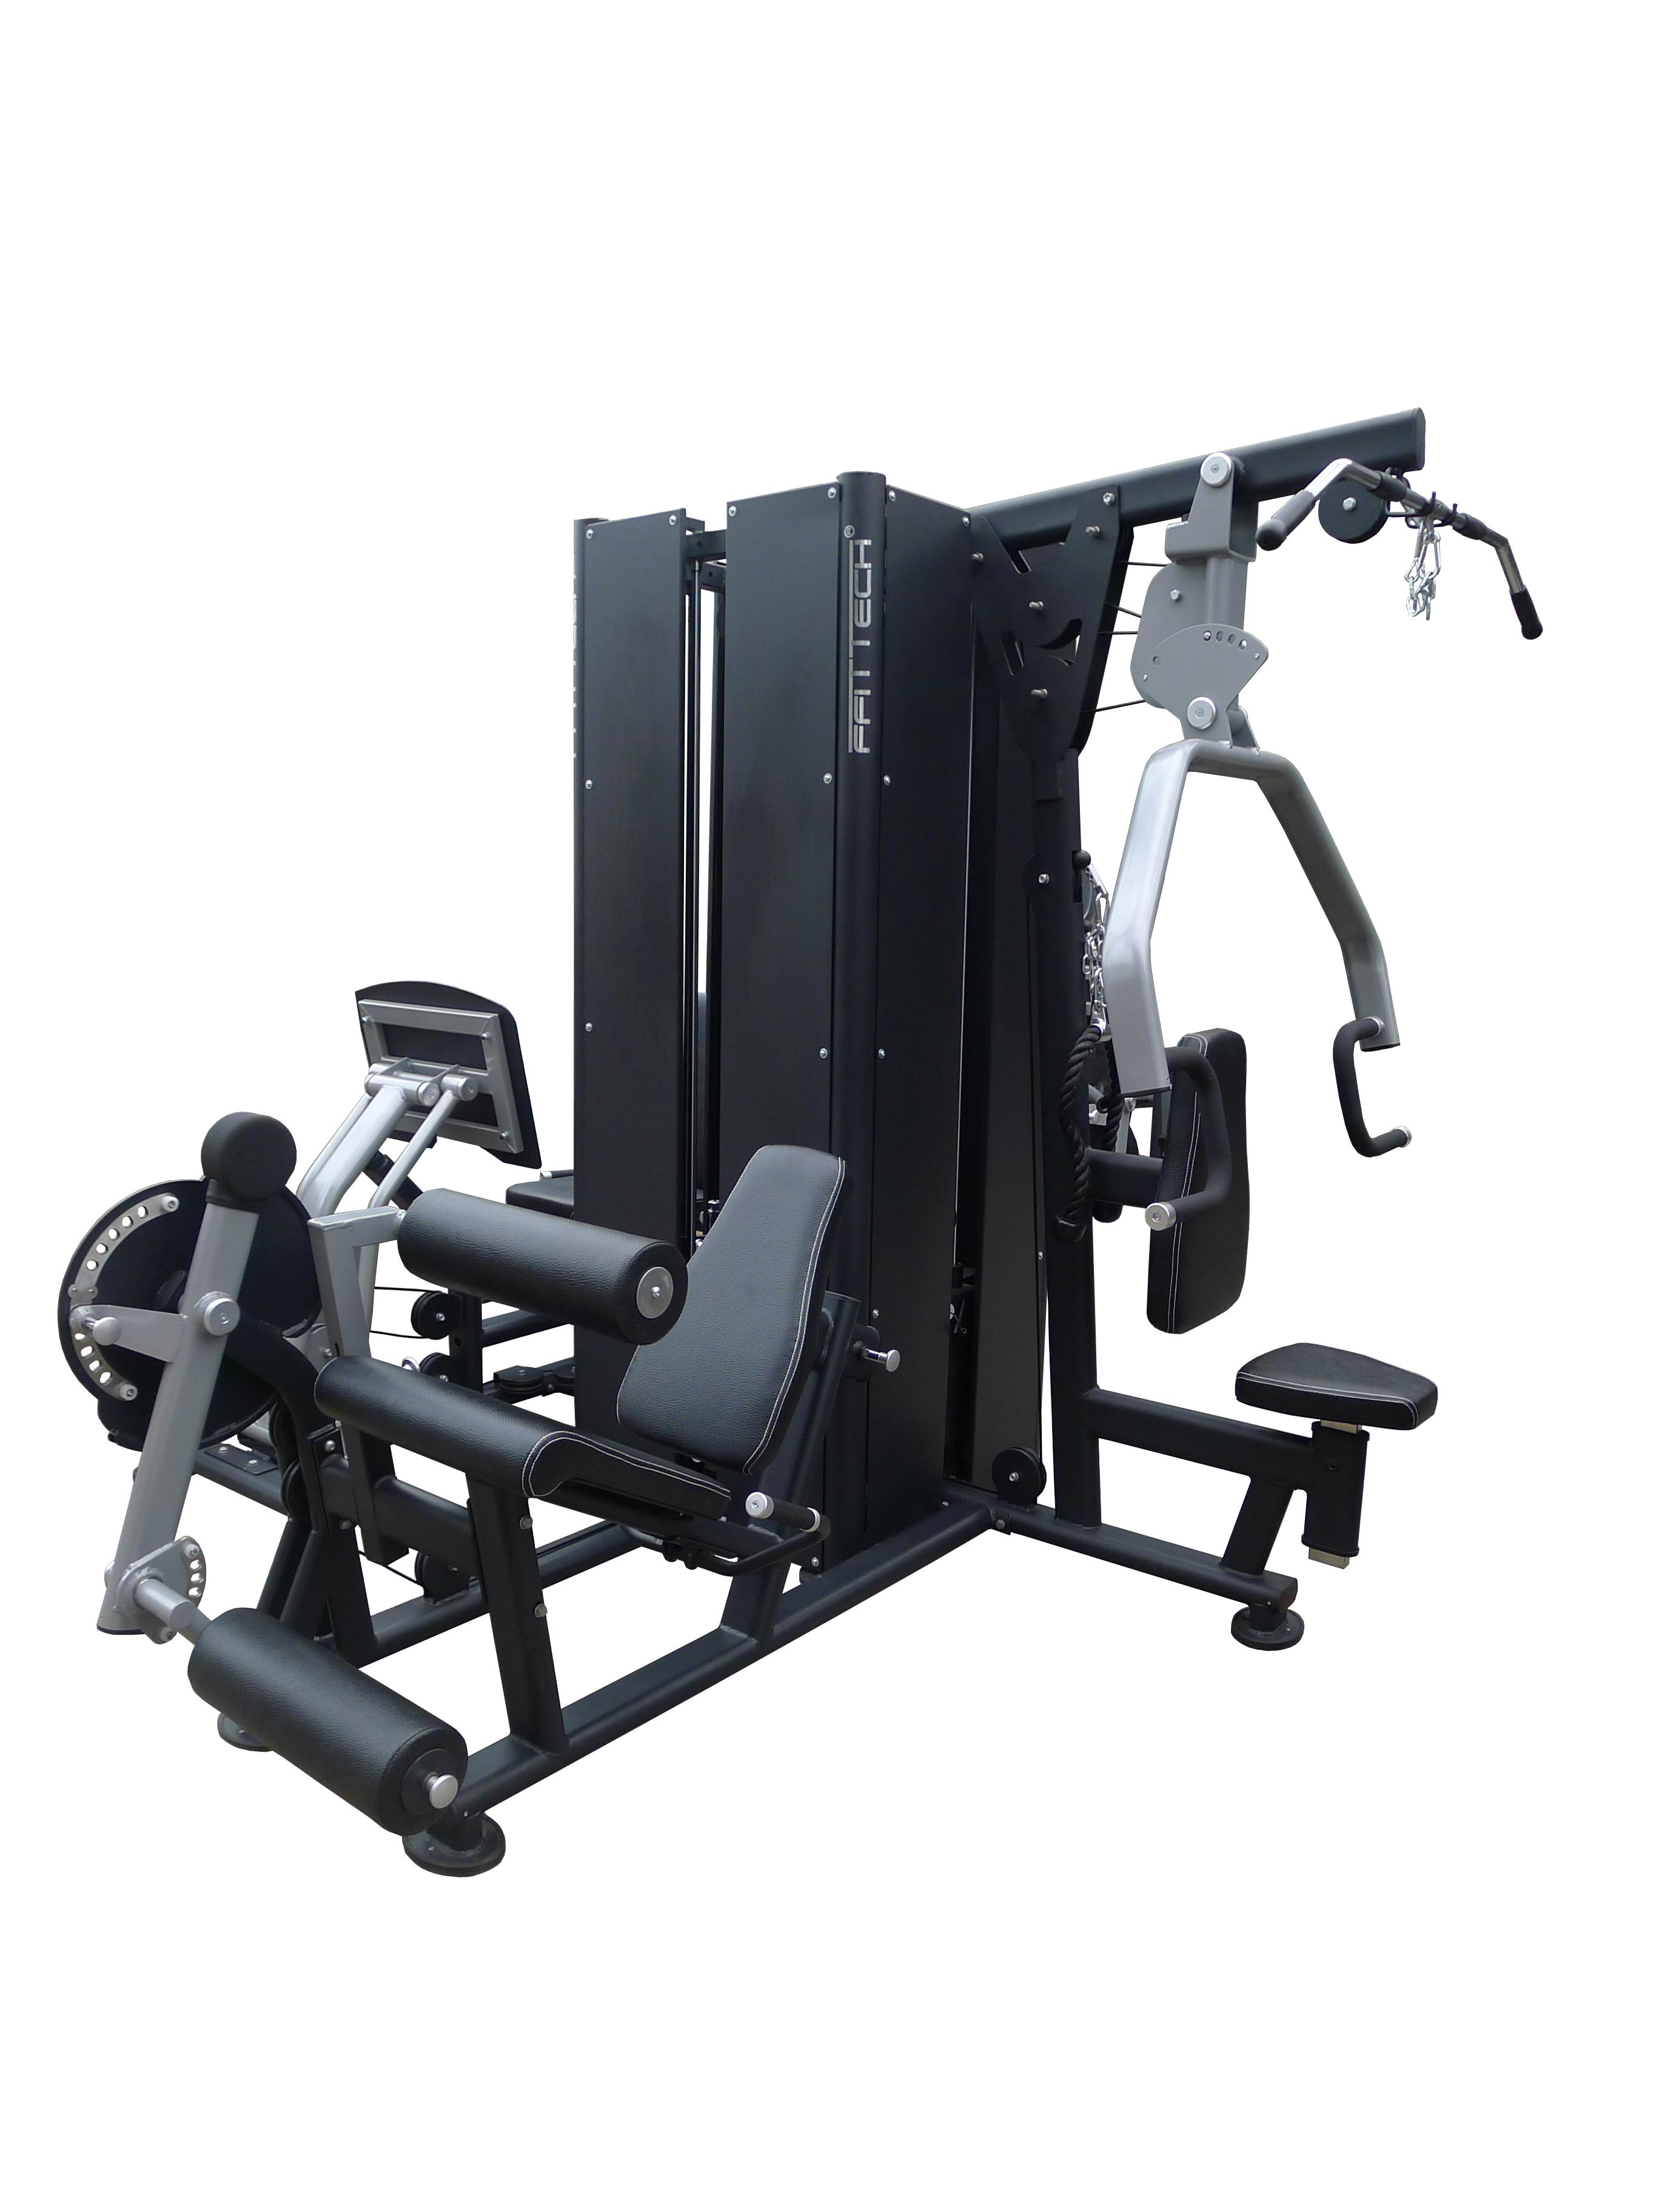 Four Gym Stations